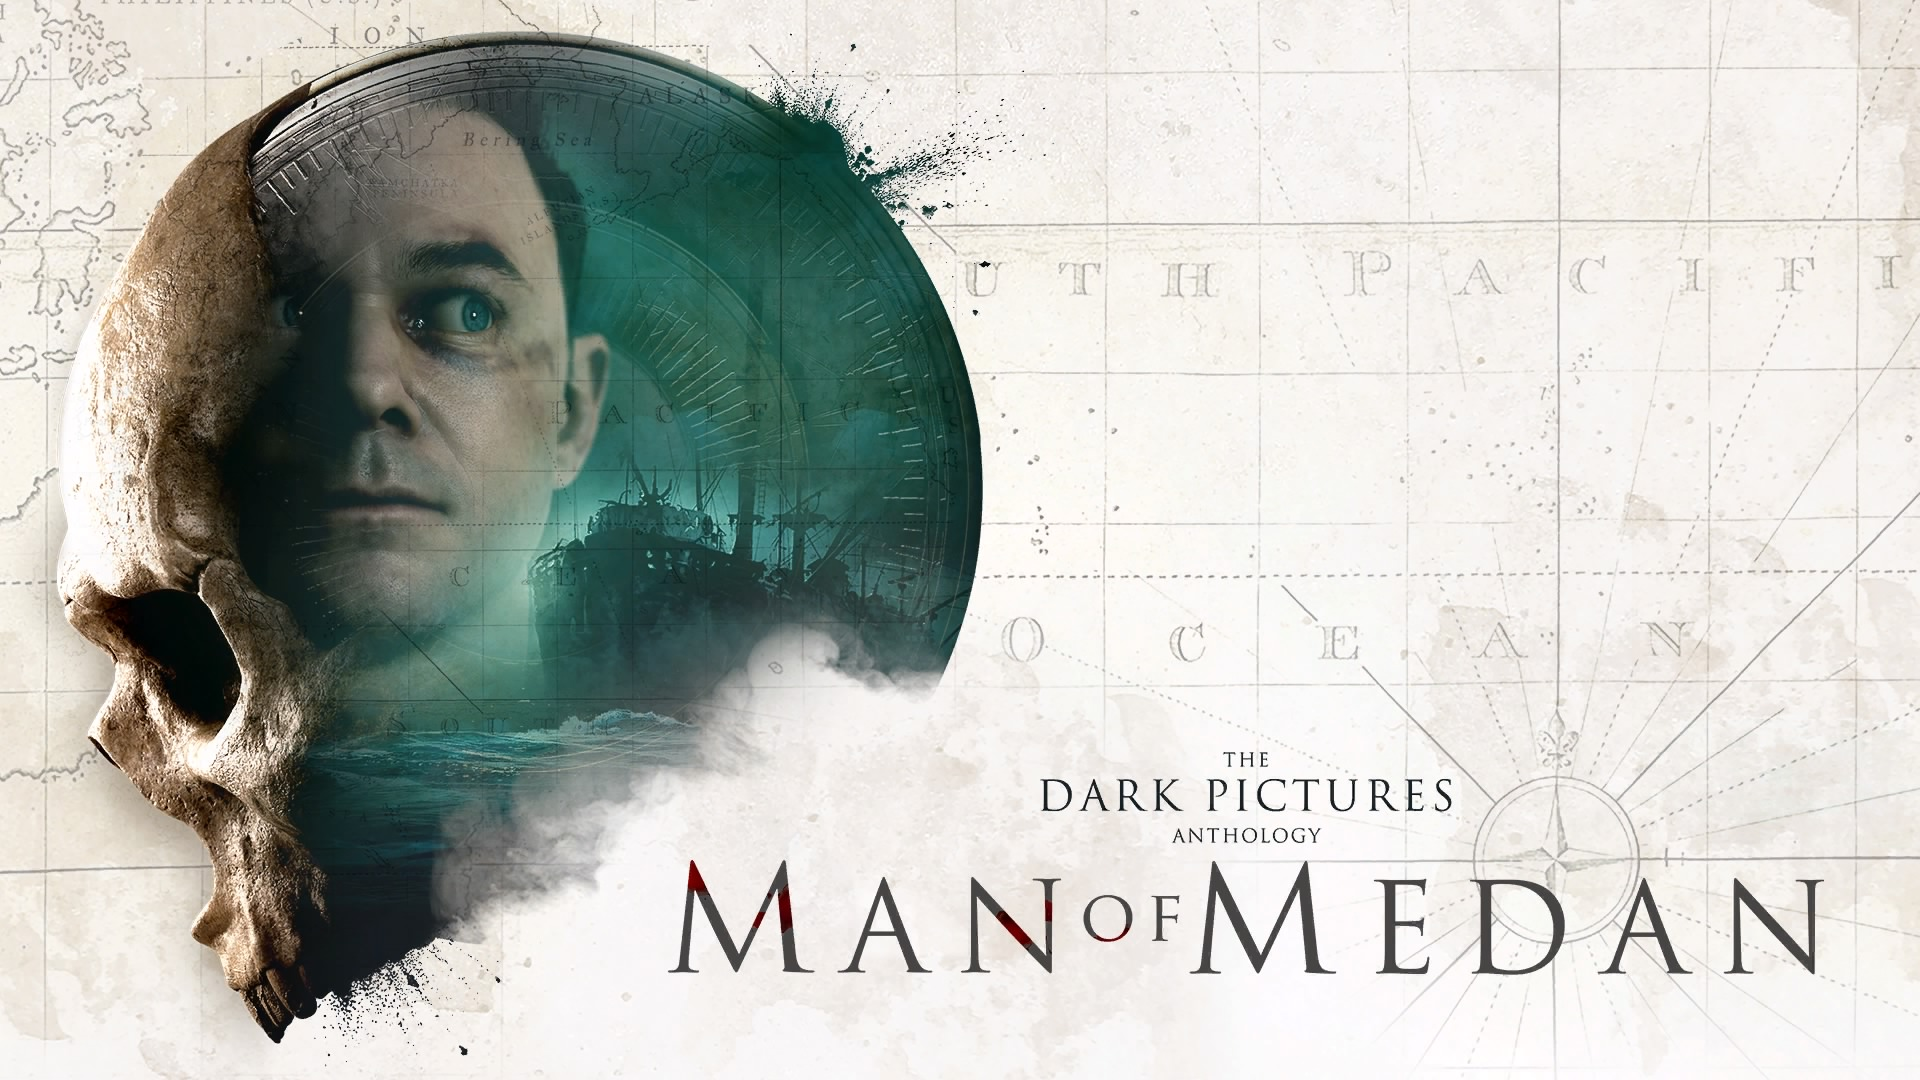 Man of Medan (2019 – Choix et survie – Playstation 4)